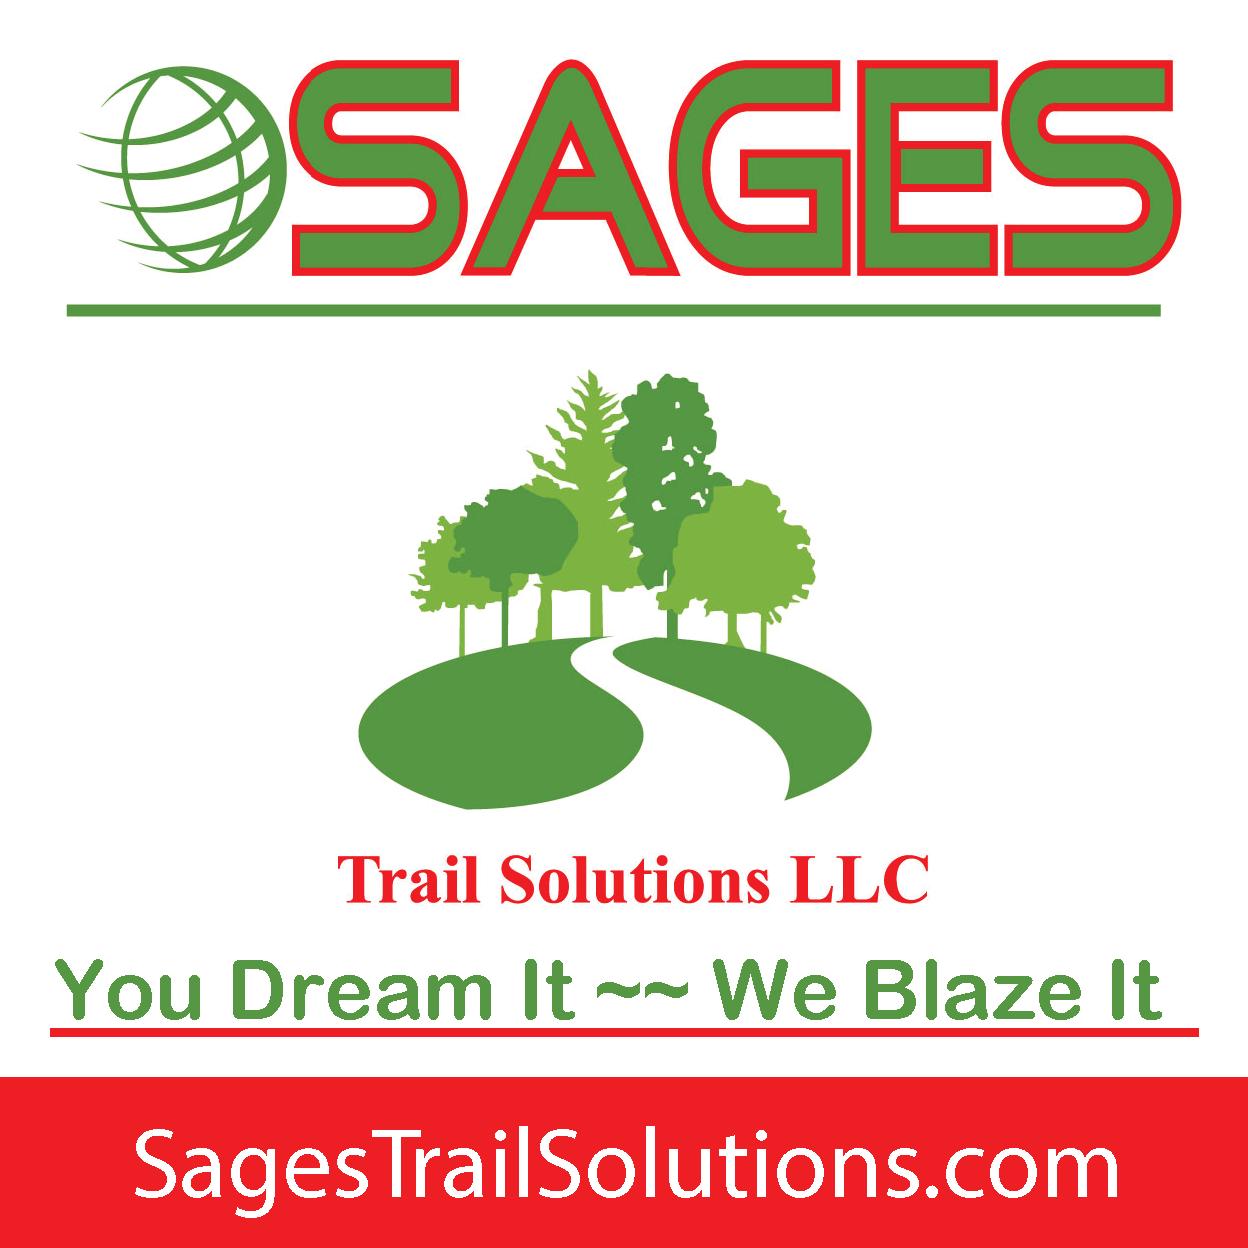 Sages Trail Solutions LLC LOGO.png